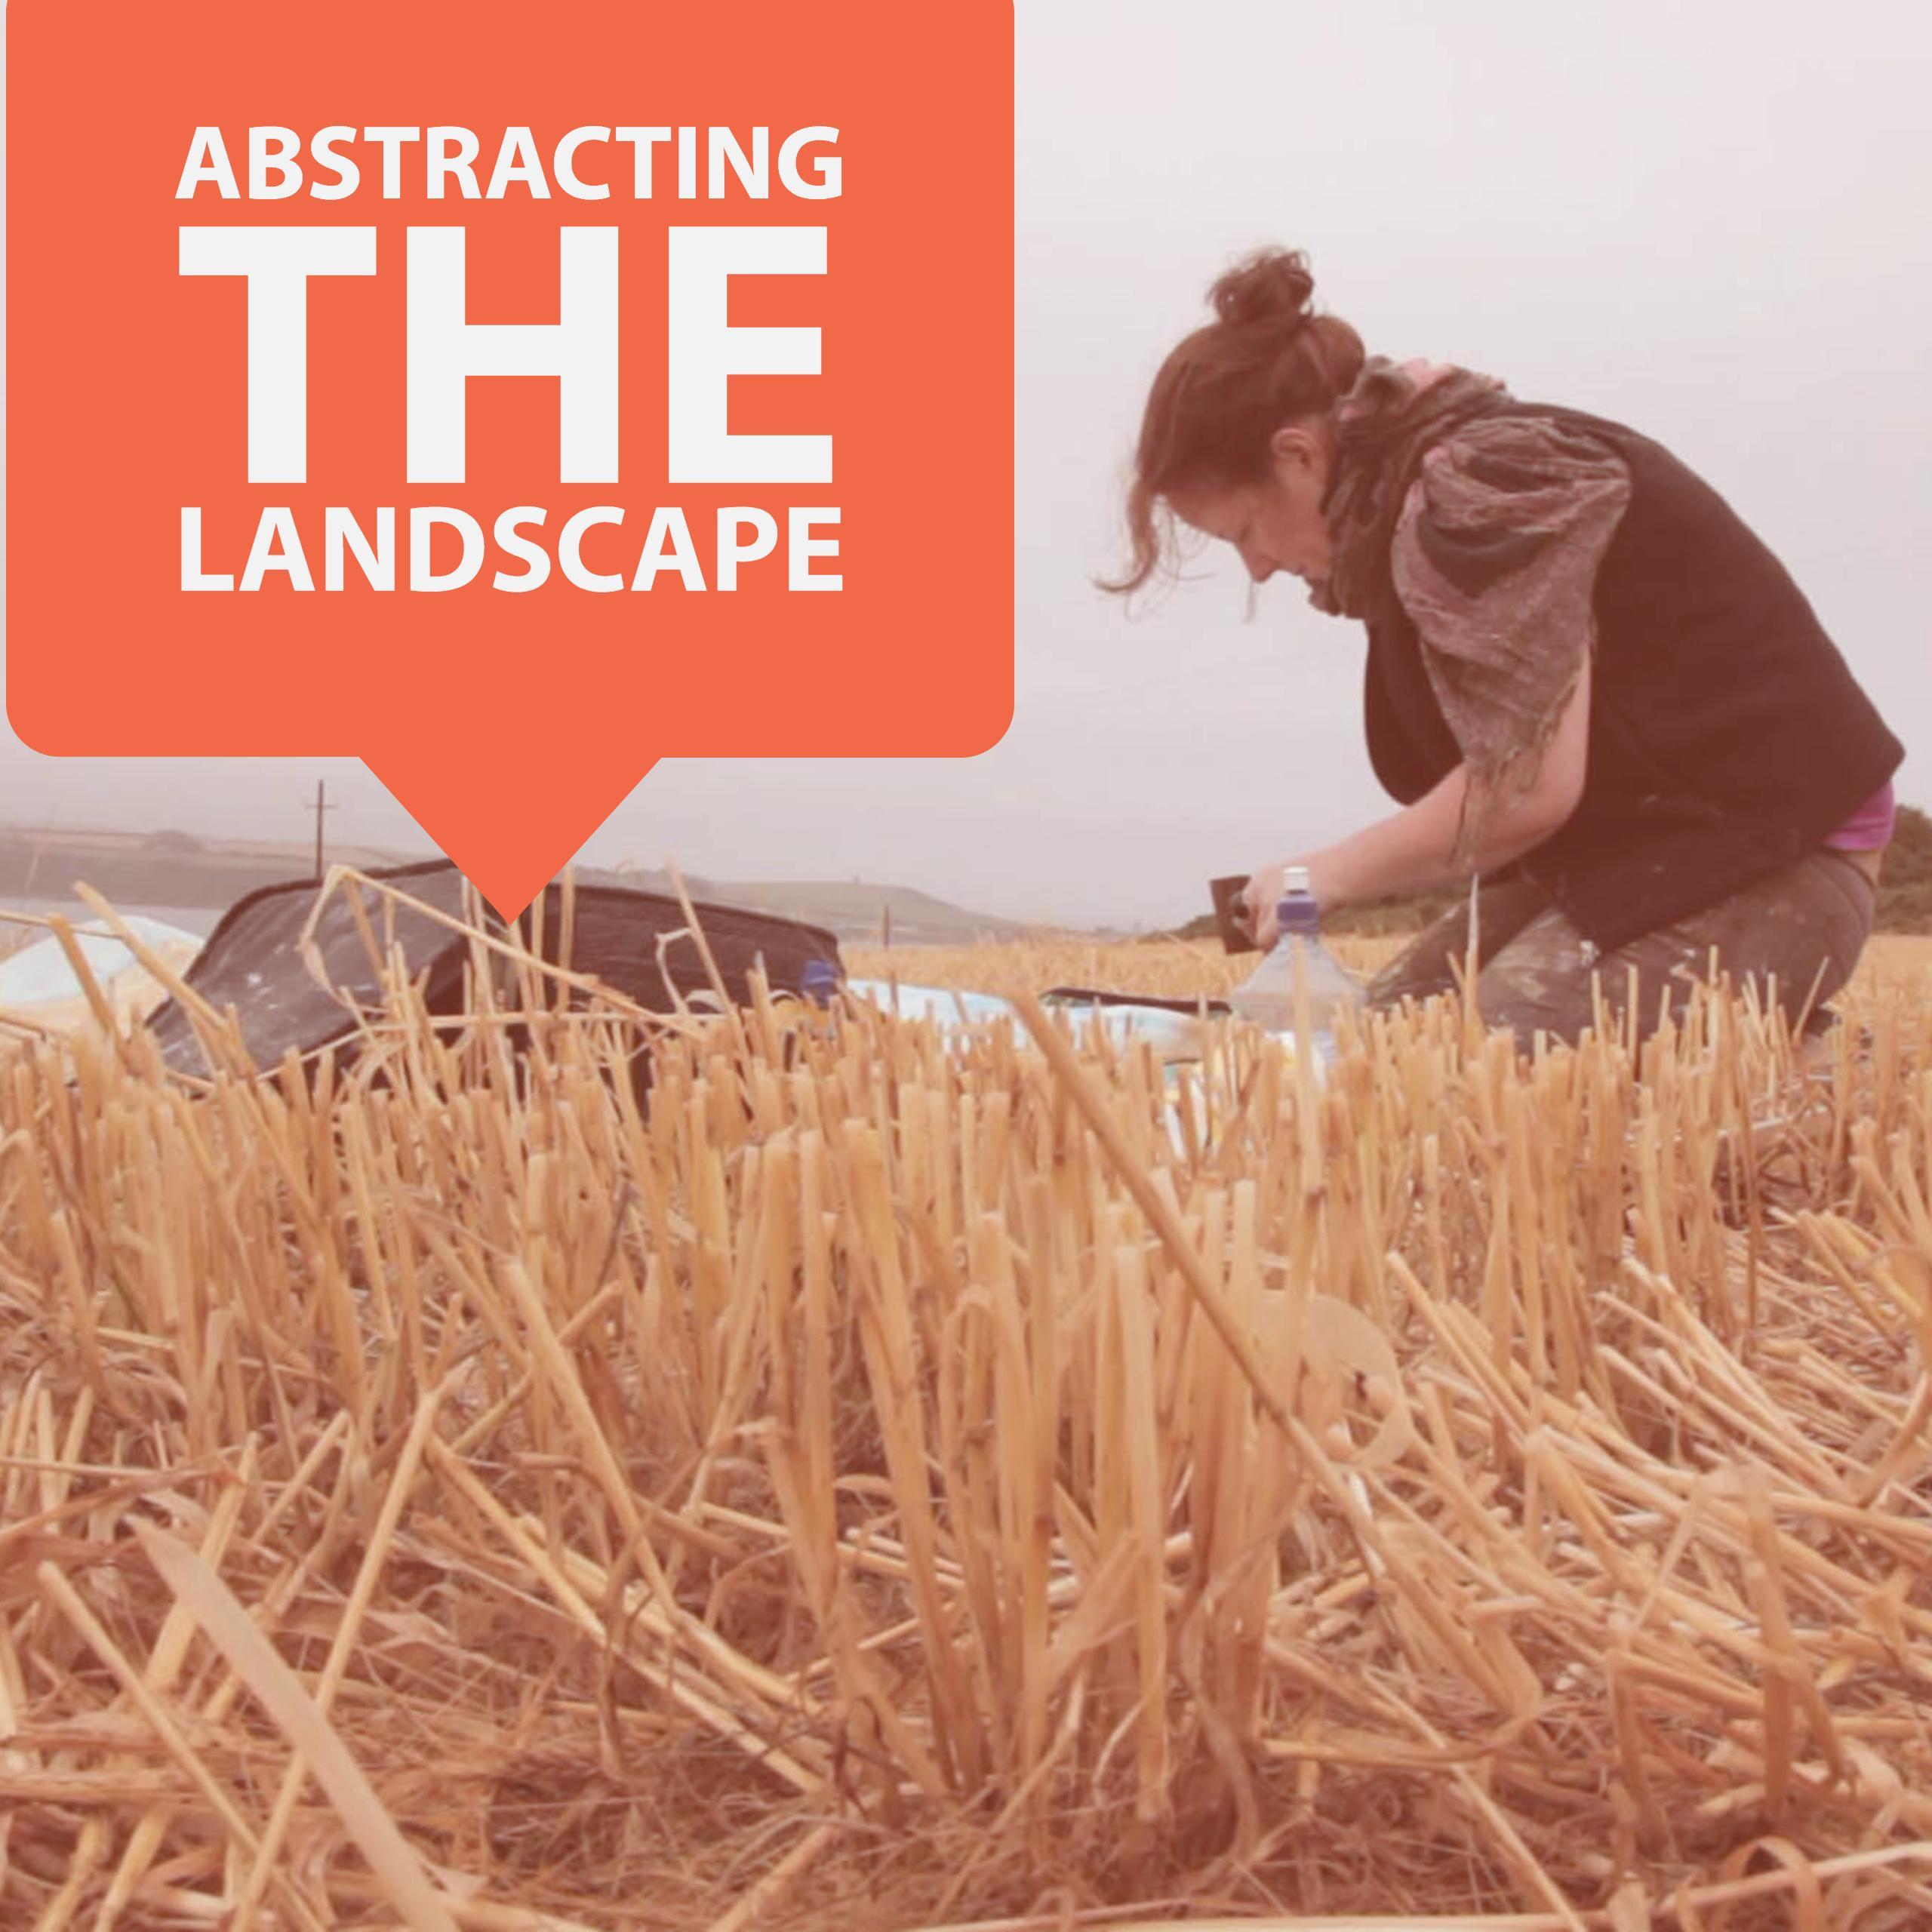 Abstracting the Landscape, 14th - 15th July, Sligo